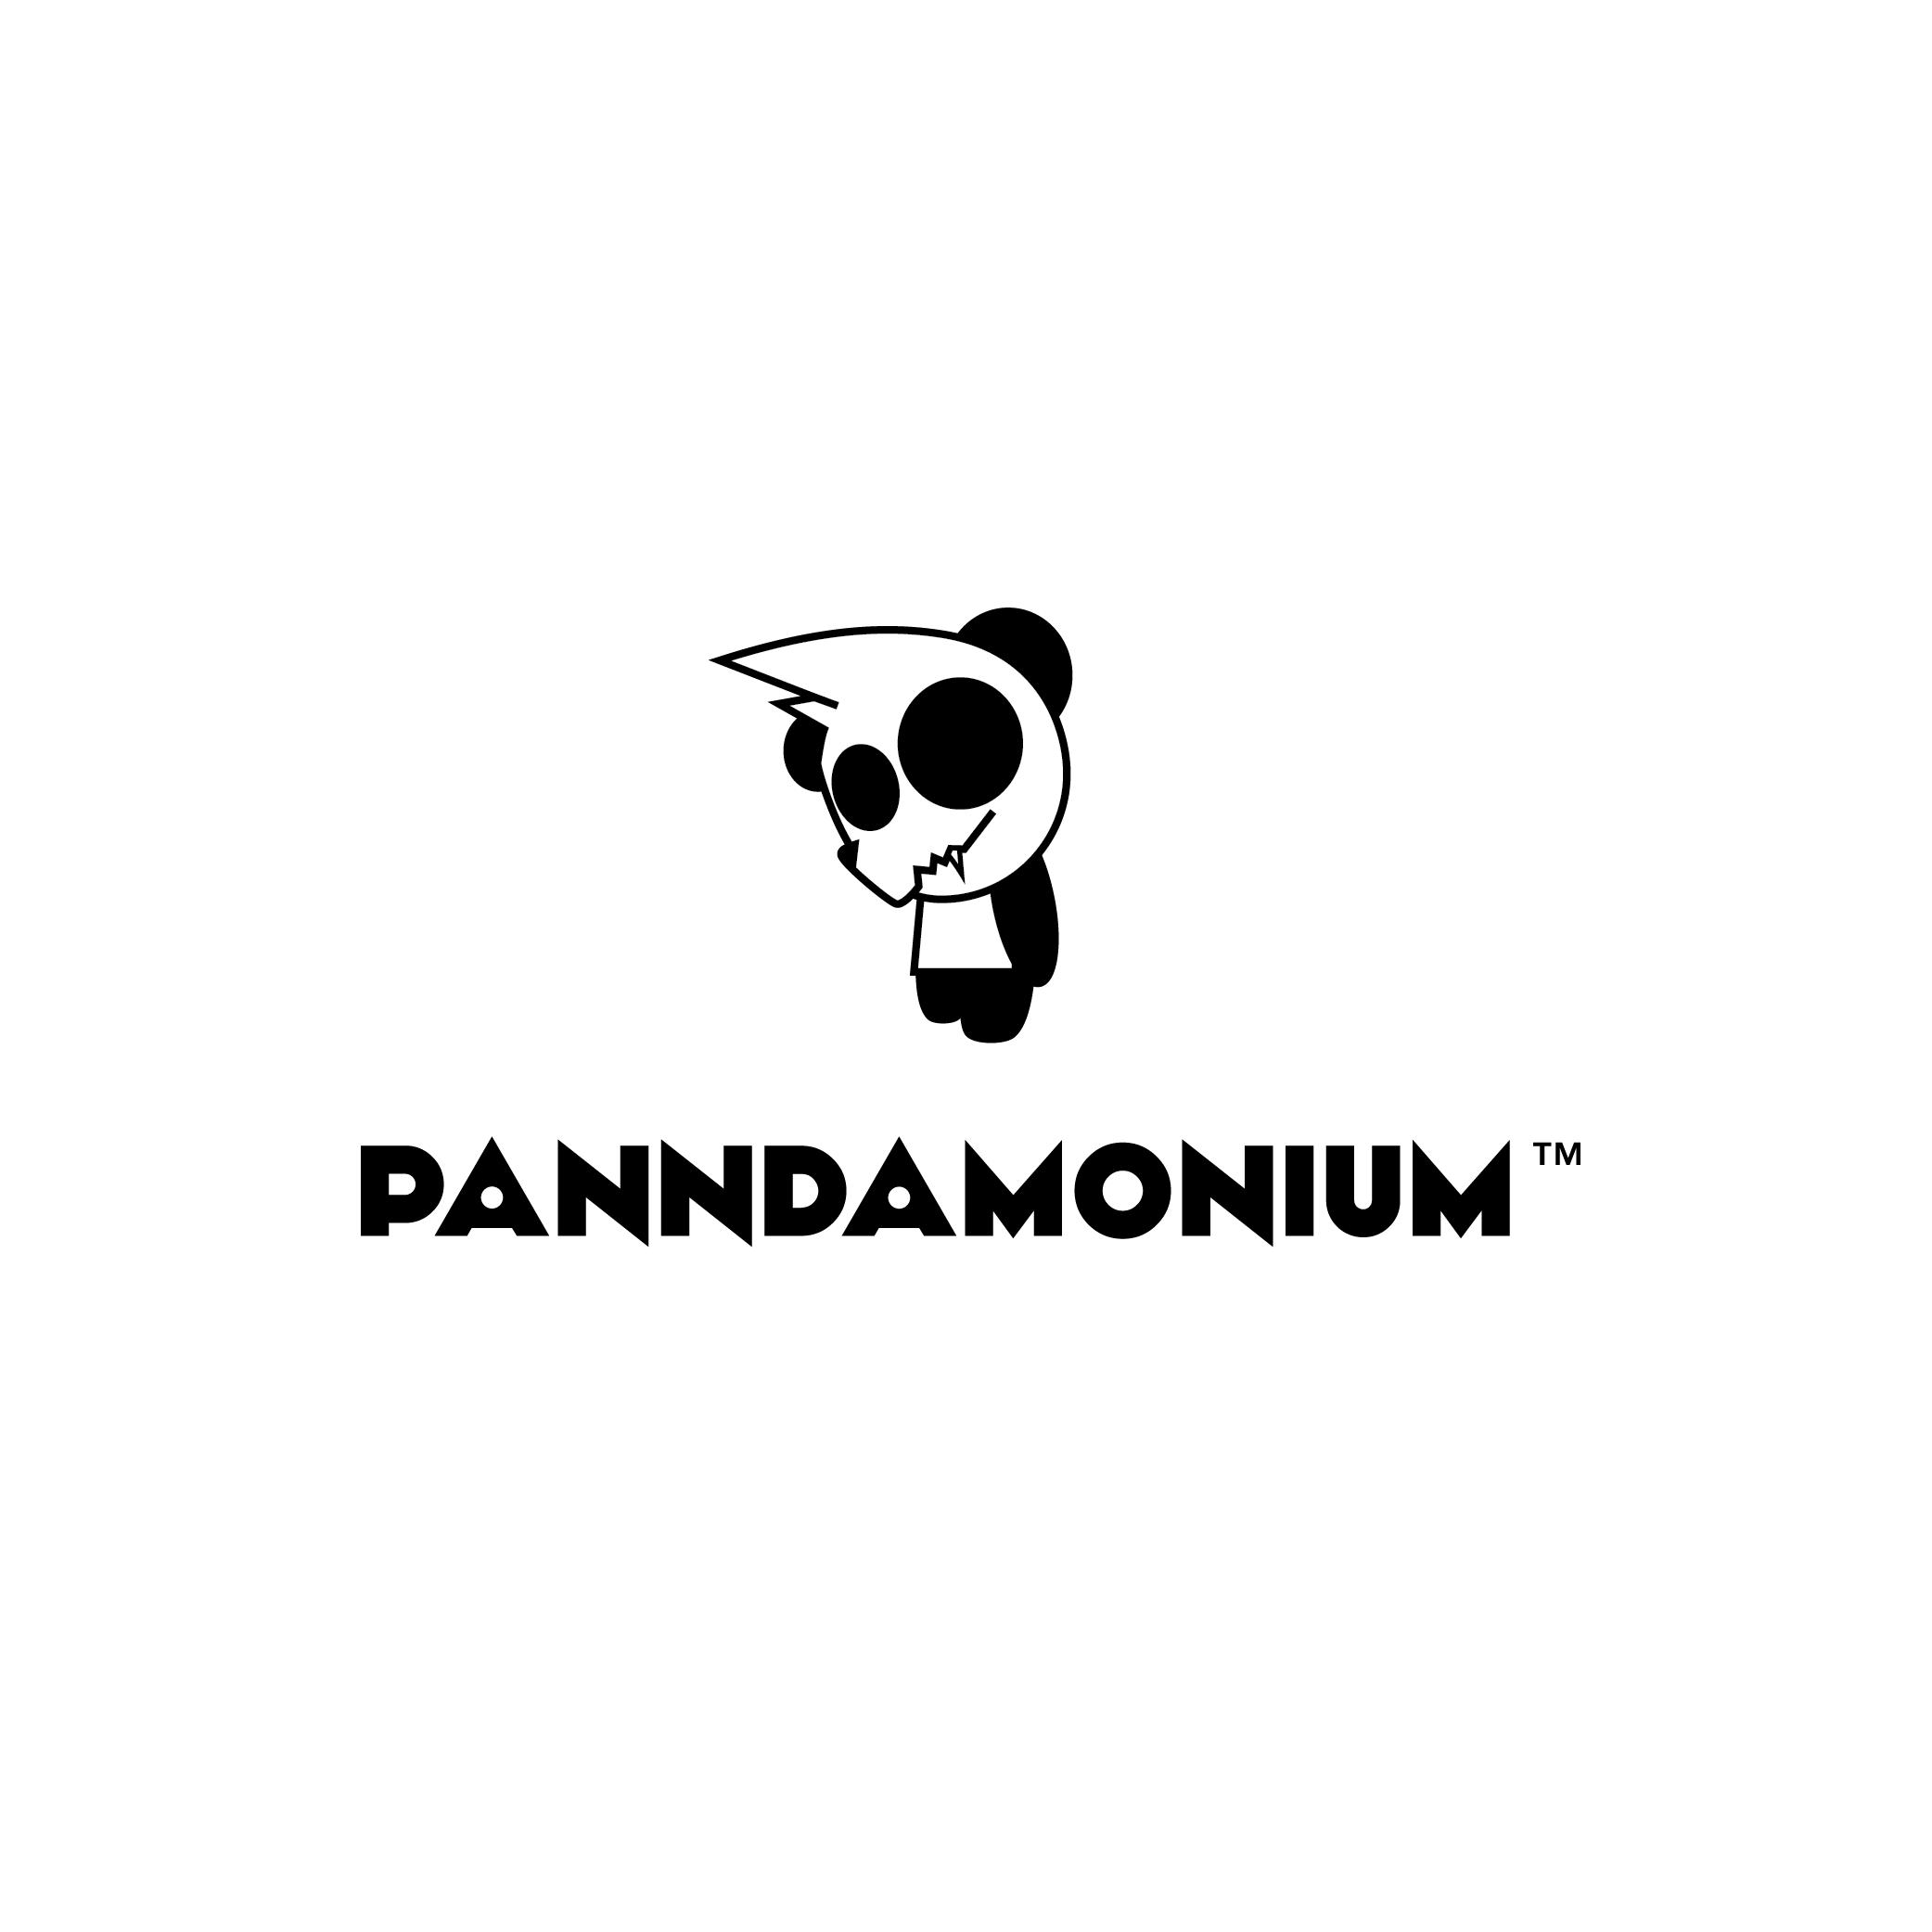 Pandamonium-01.png